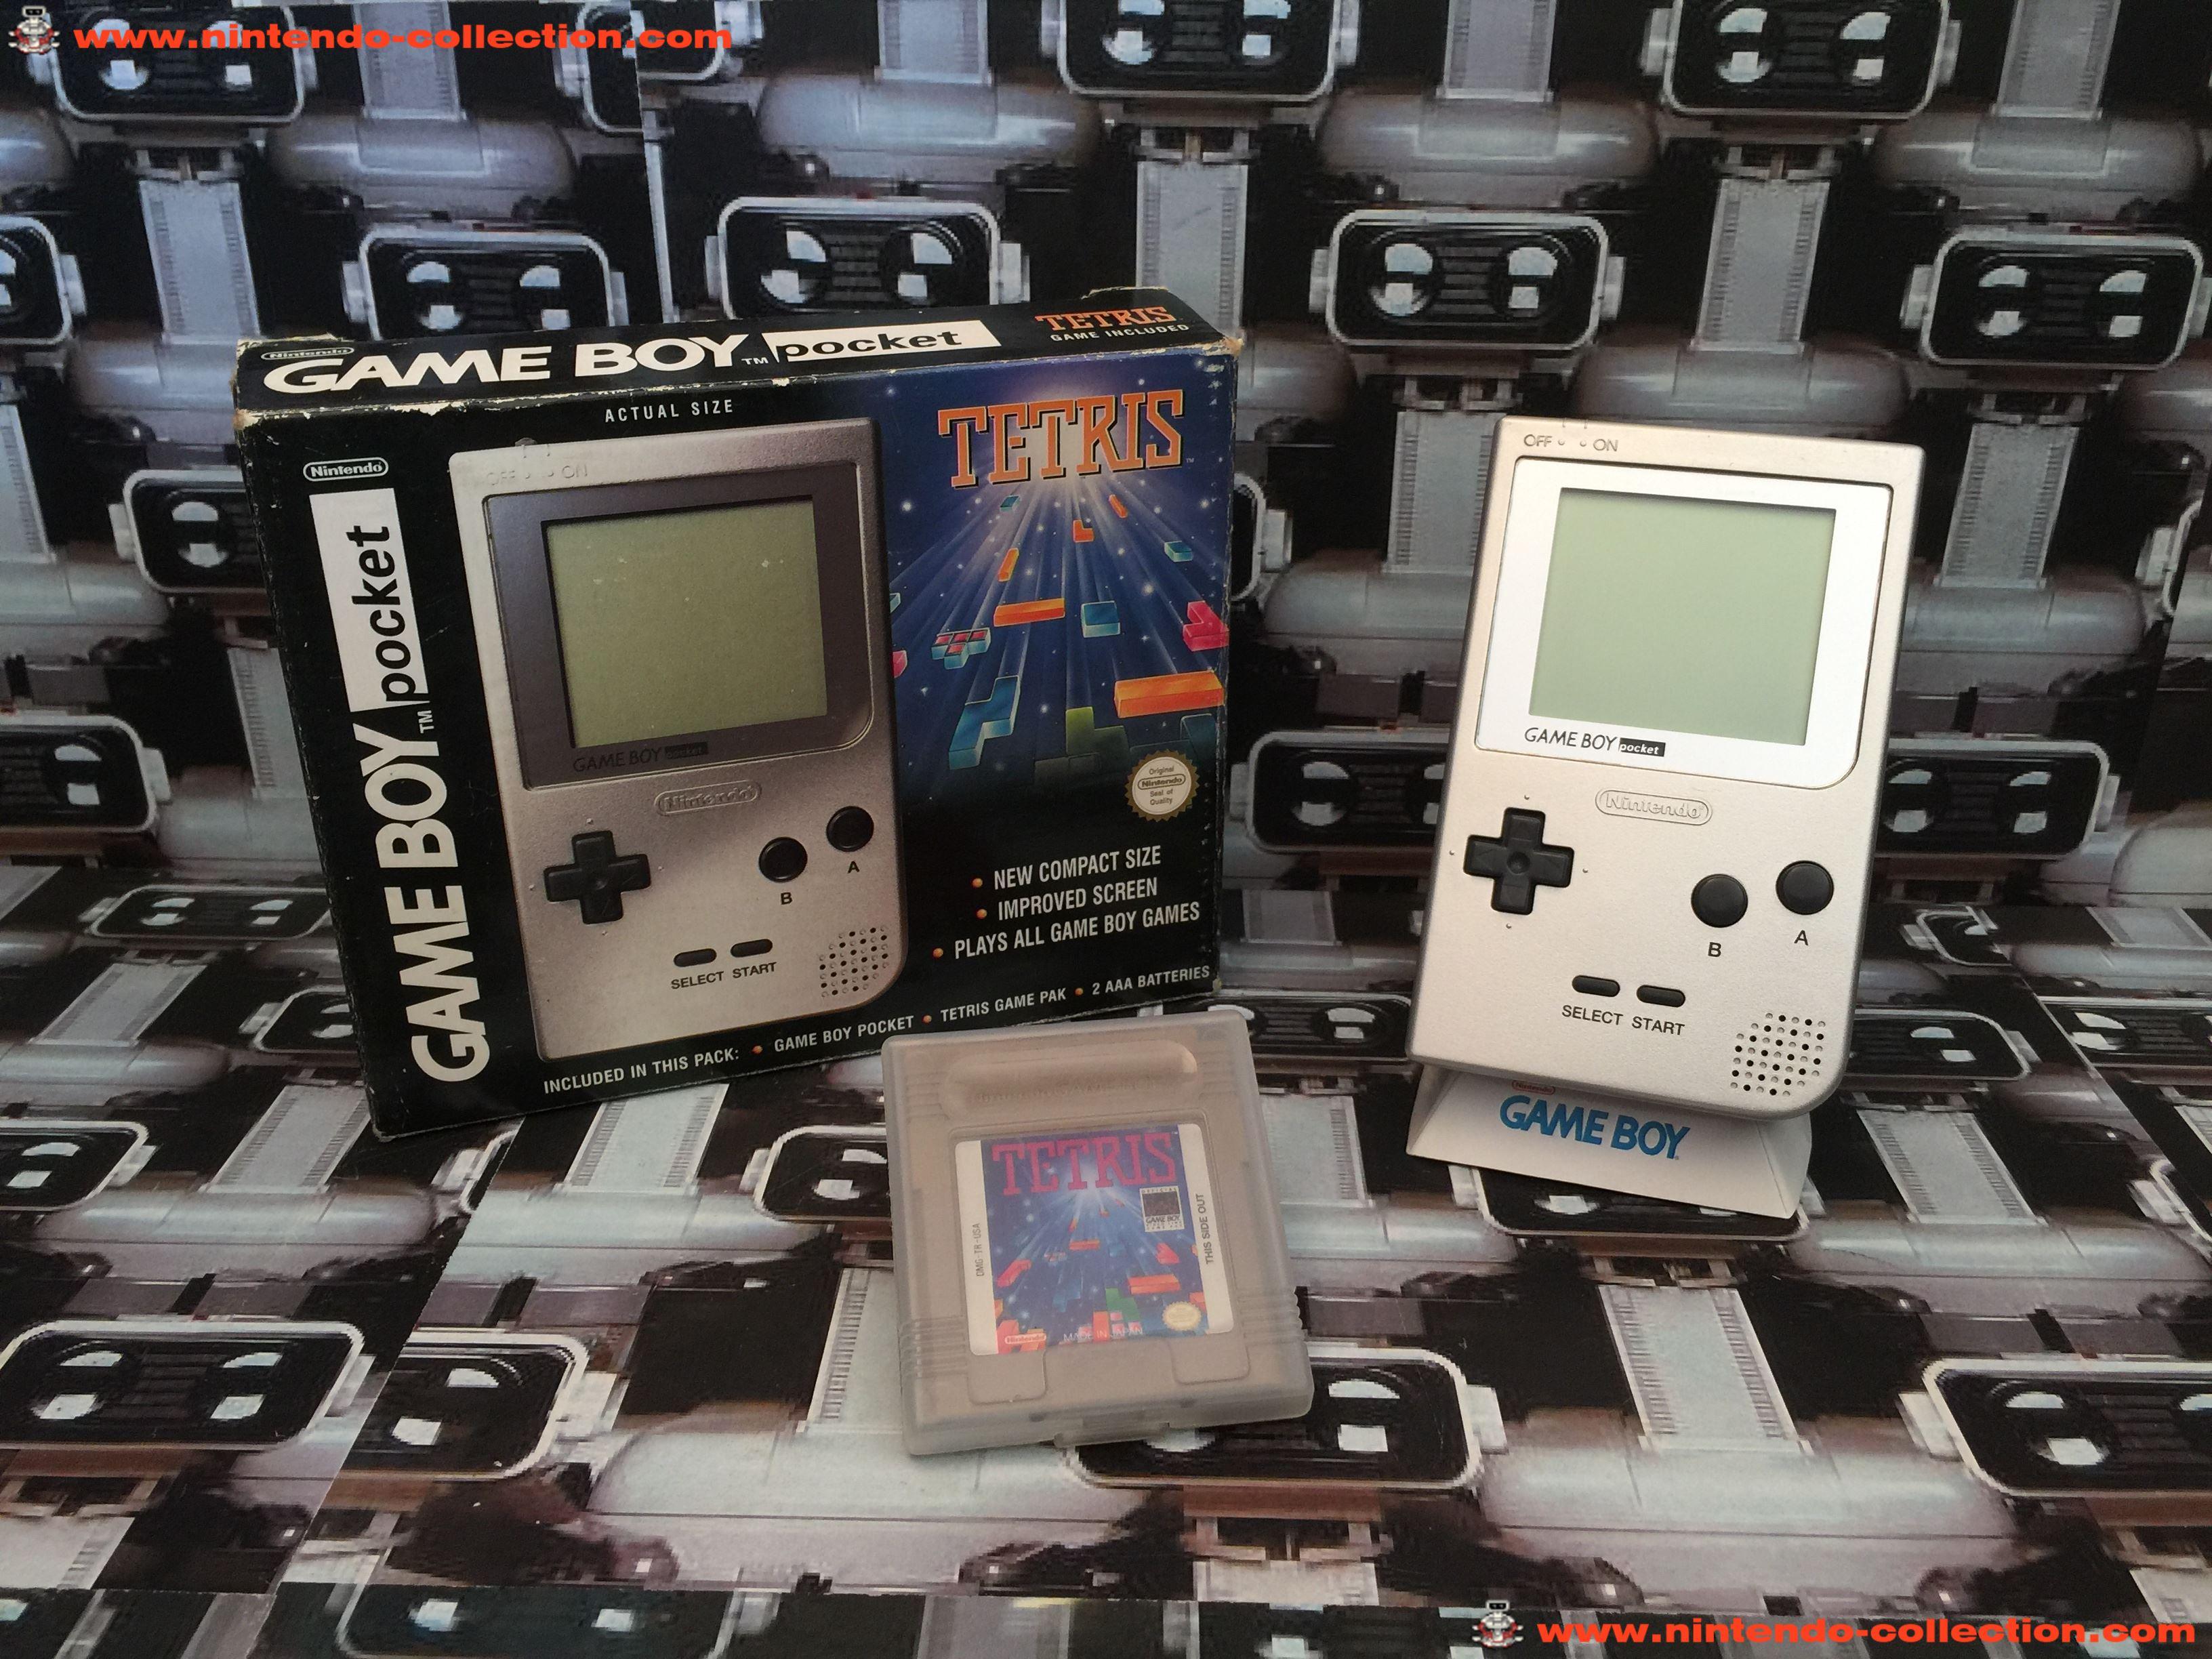 www.nintendo-collection.com - Gameboy GB Pack Tetris Silver Argent  ecran chrome no LED UK version u